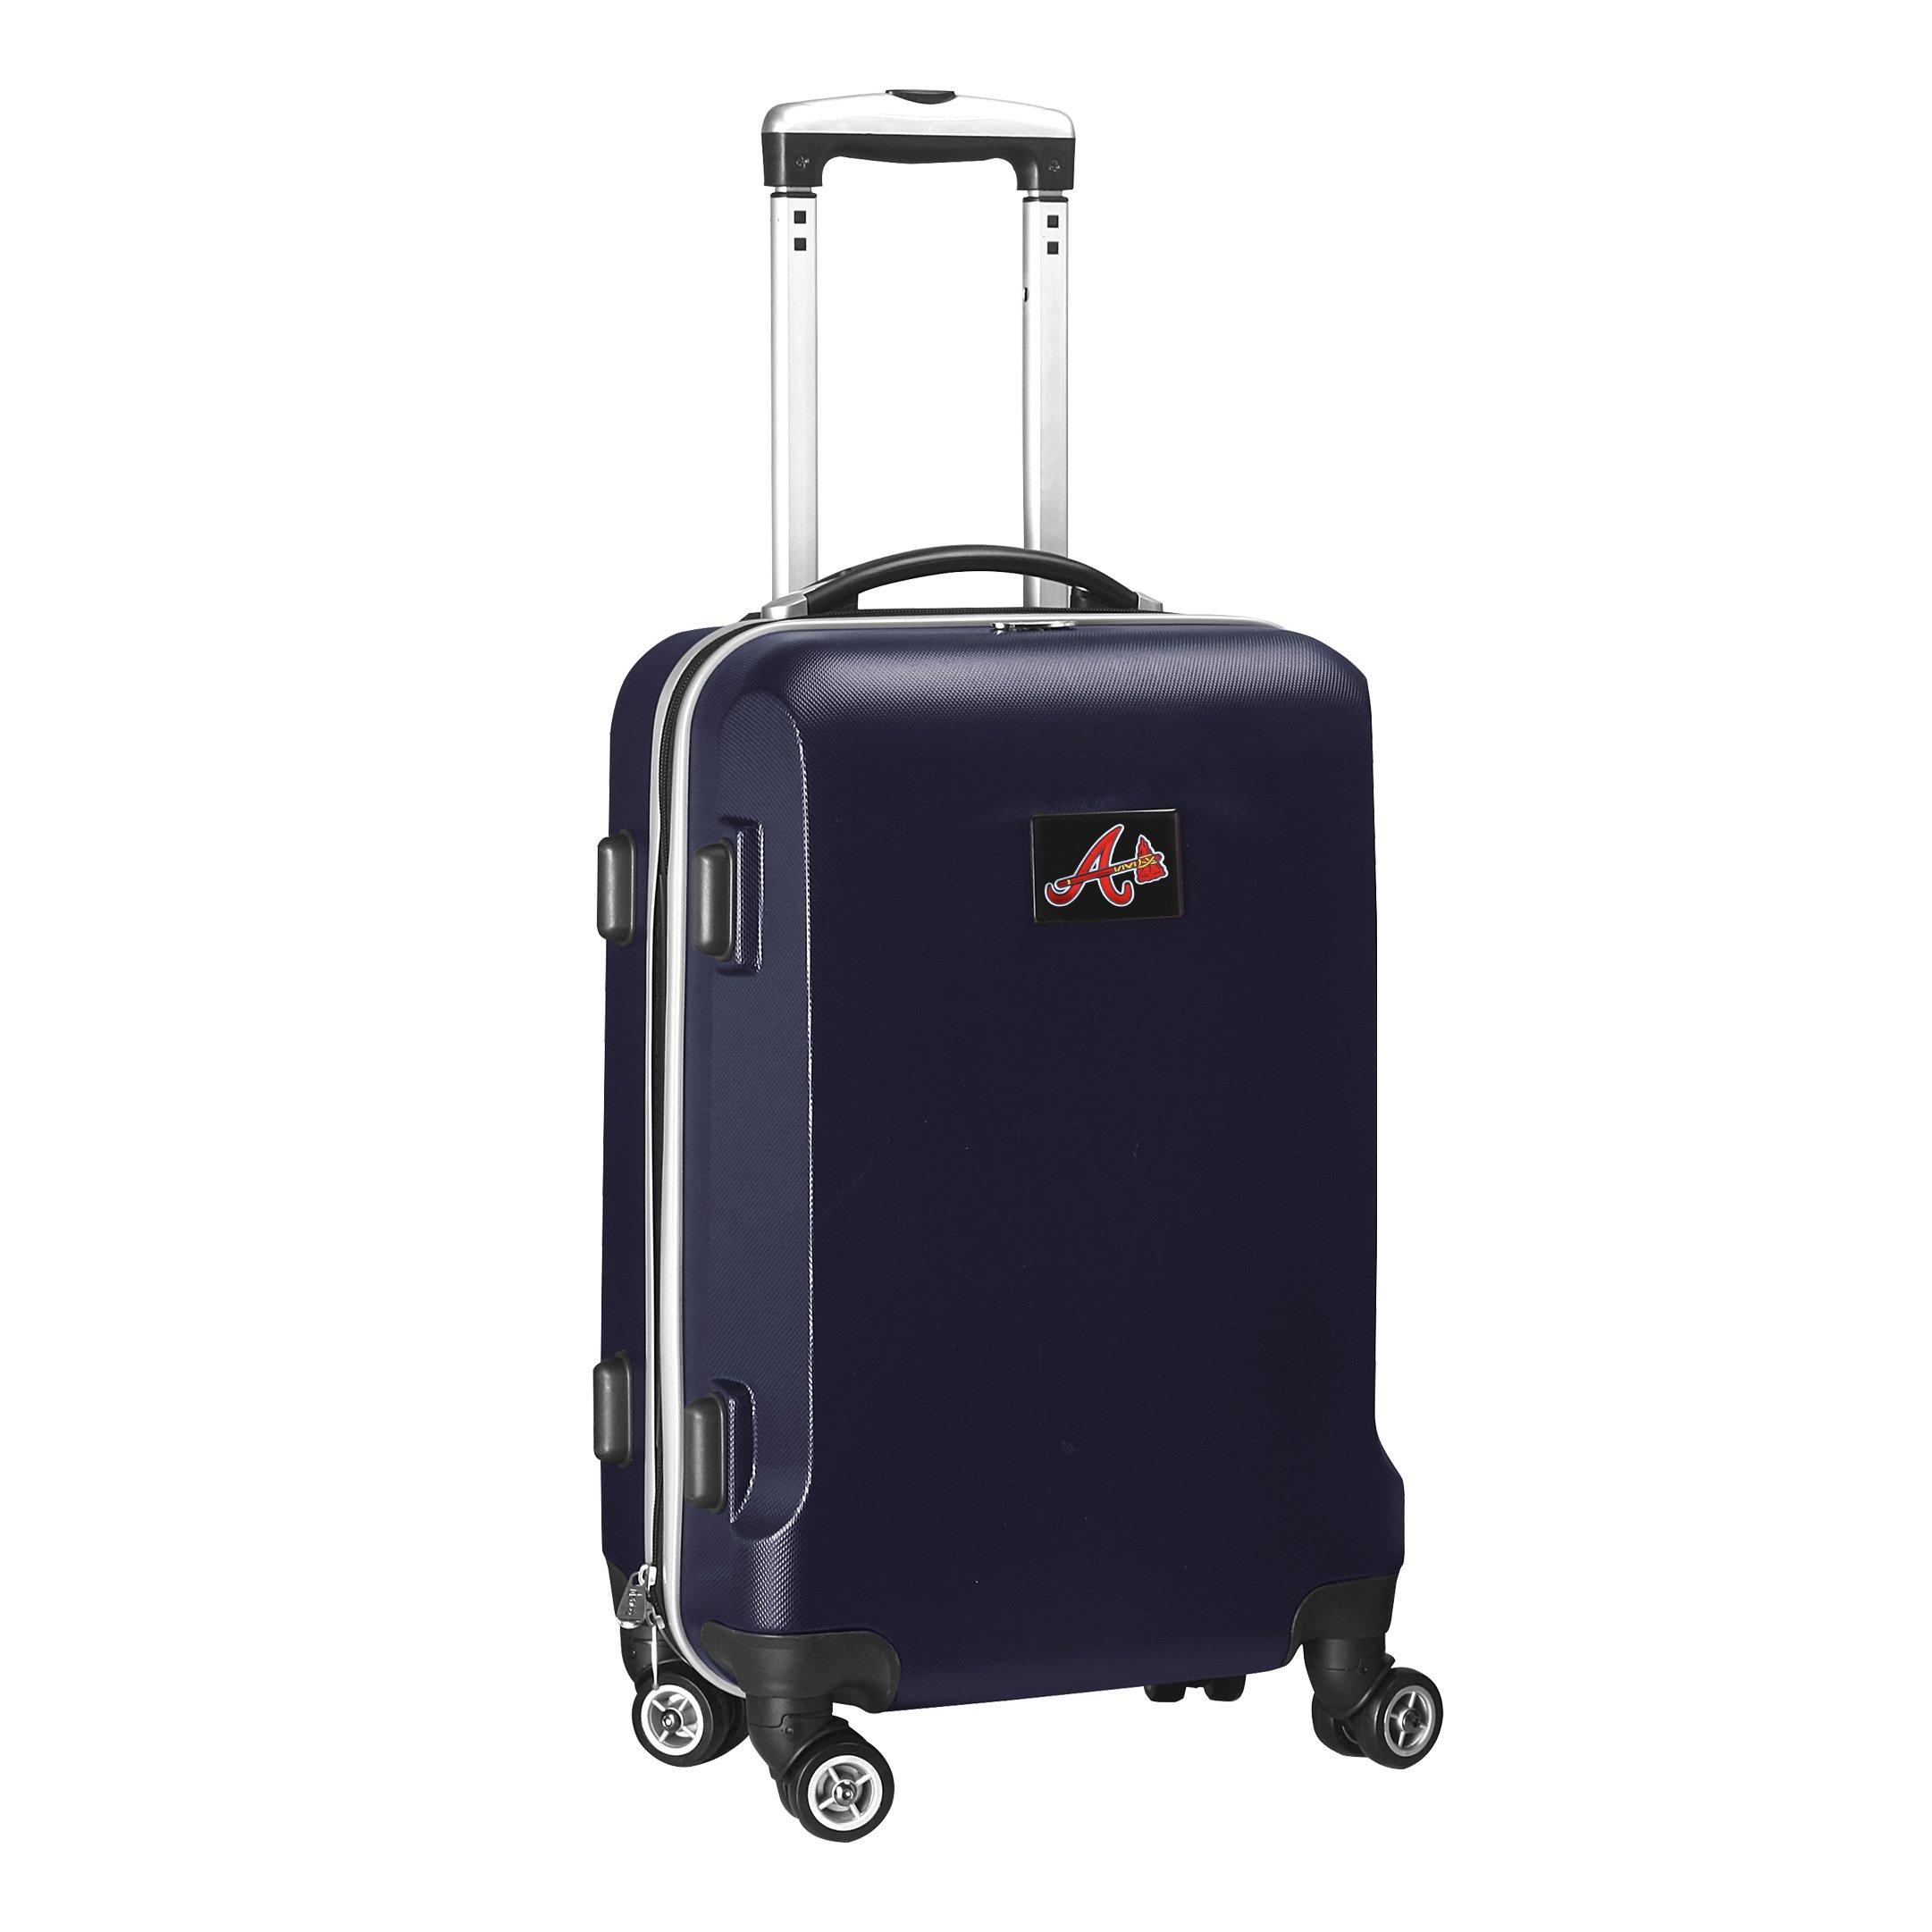 MLB Atlanta Braves Carry-On Hardcase Spinner, Navy